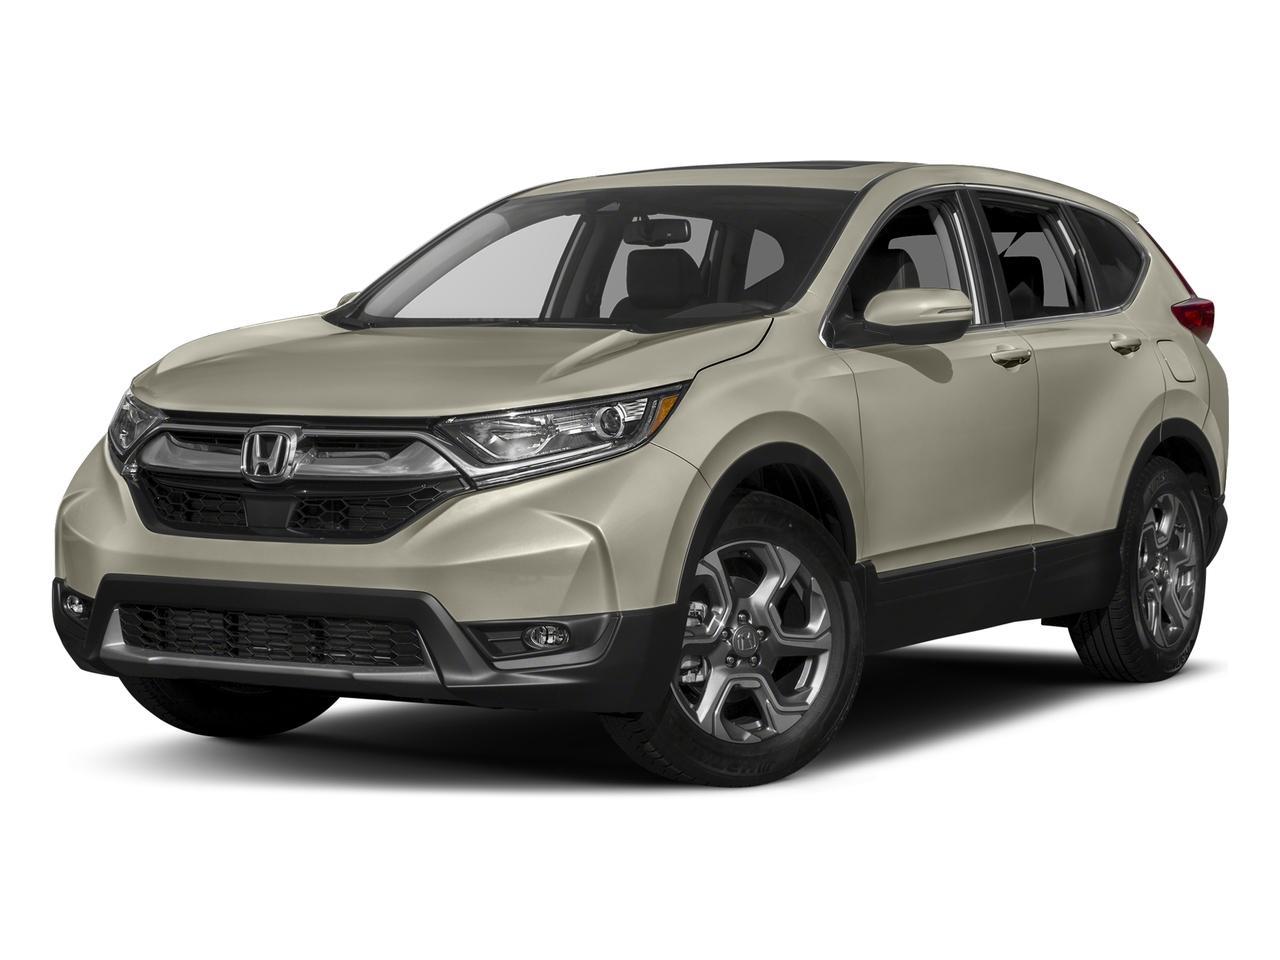 2017 Honda CR-V Vehicle Photo in San Antonio, TX 78238